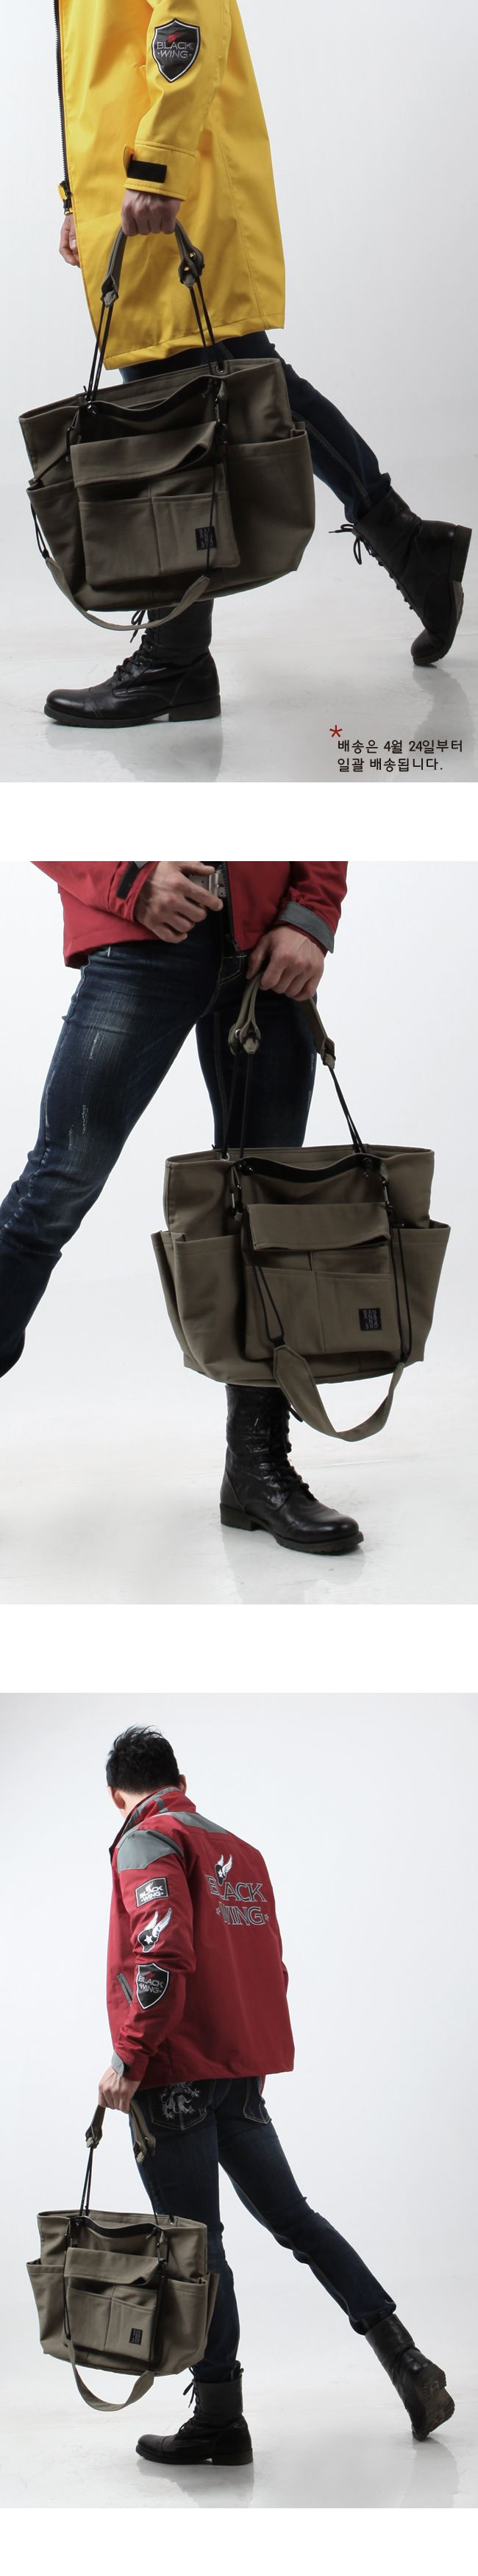 "Korea Designer Menswear Brand ""Green Banana""   www.greenbanana.co.kr  Order inquiry--> skyshdns@naver.com  #greenbanana #fashion #style #bike #rider #Jeans #pants #Embroidery #unique #koreafashion #menfashion #menswear #bag"